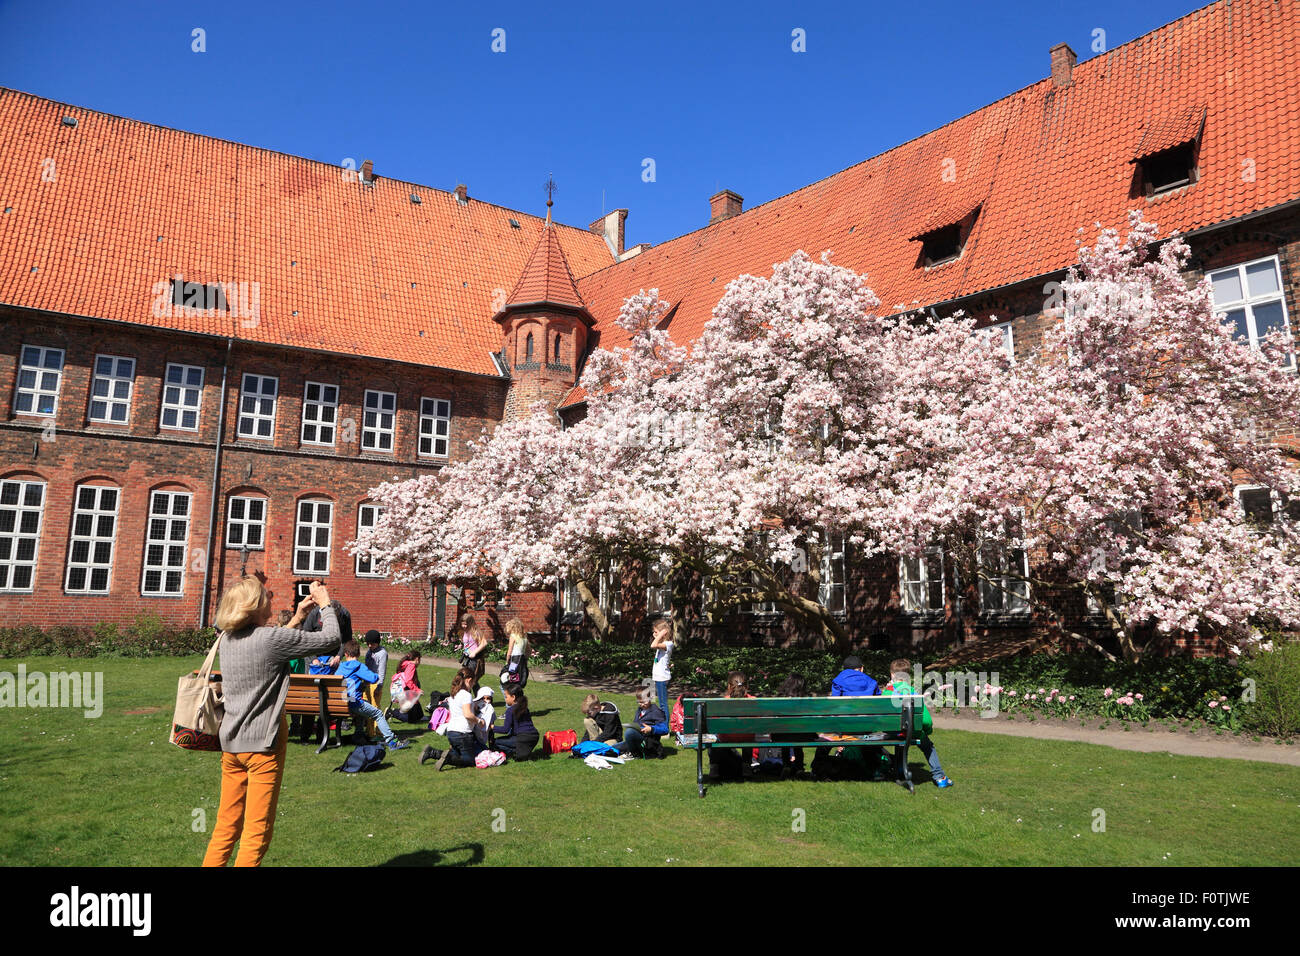 Blooming  Magnolia tree at town hall garden, Lueneburg, Lüneburg, Lower Saxony, Germany, Europe Stock Photo